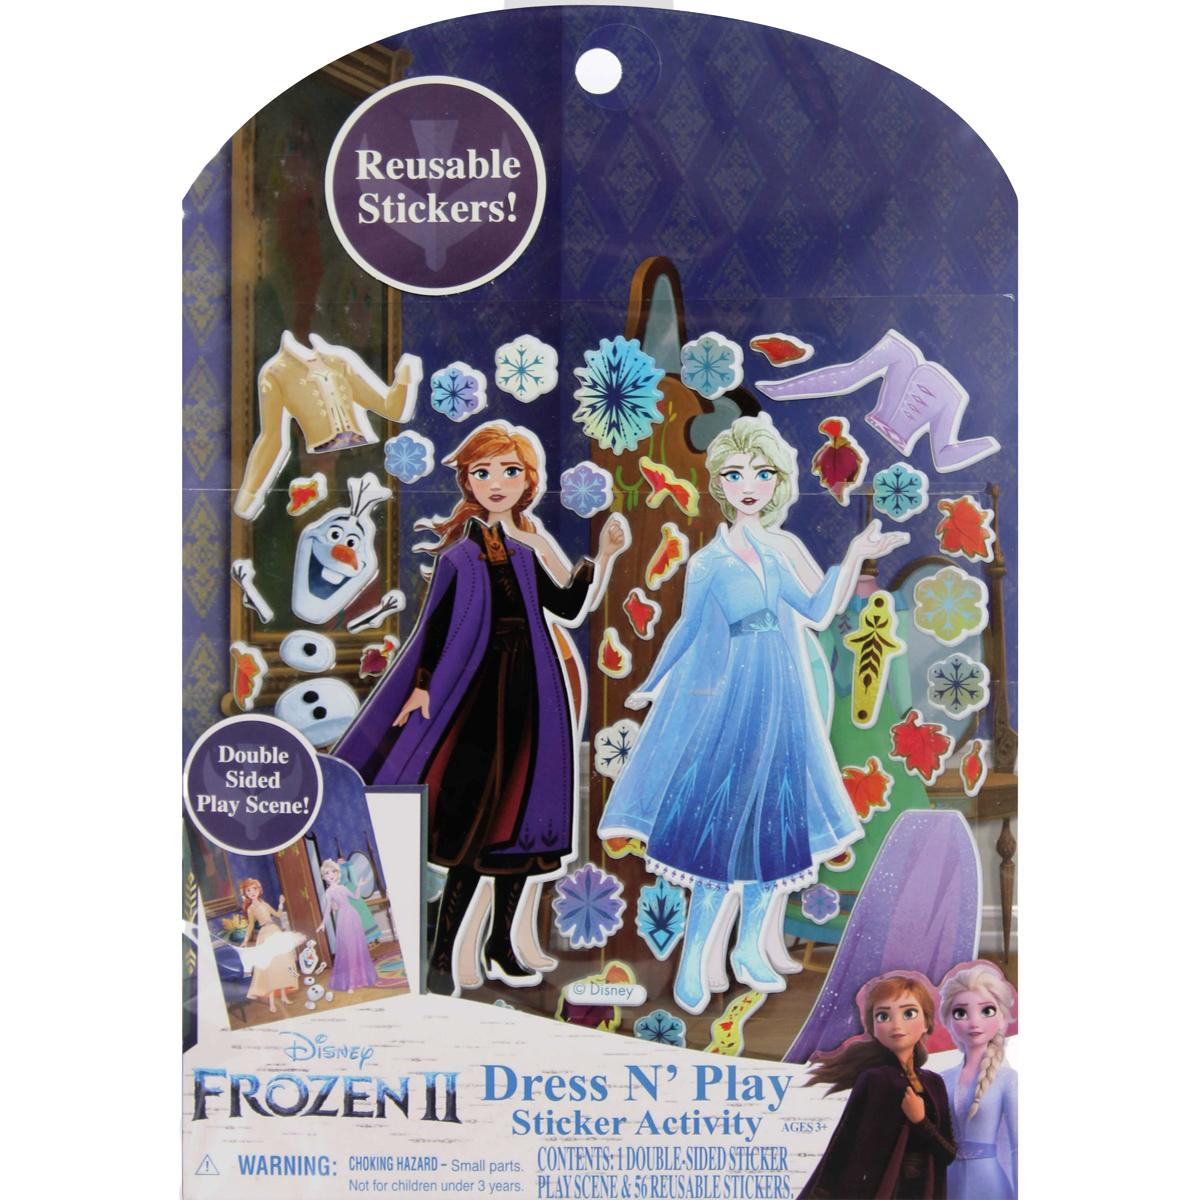 Frozen 2 Dress N Play Sticker Activity